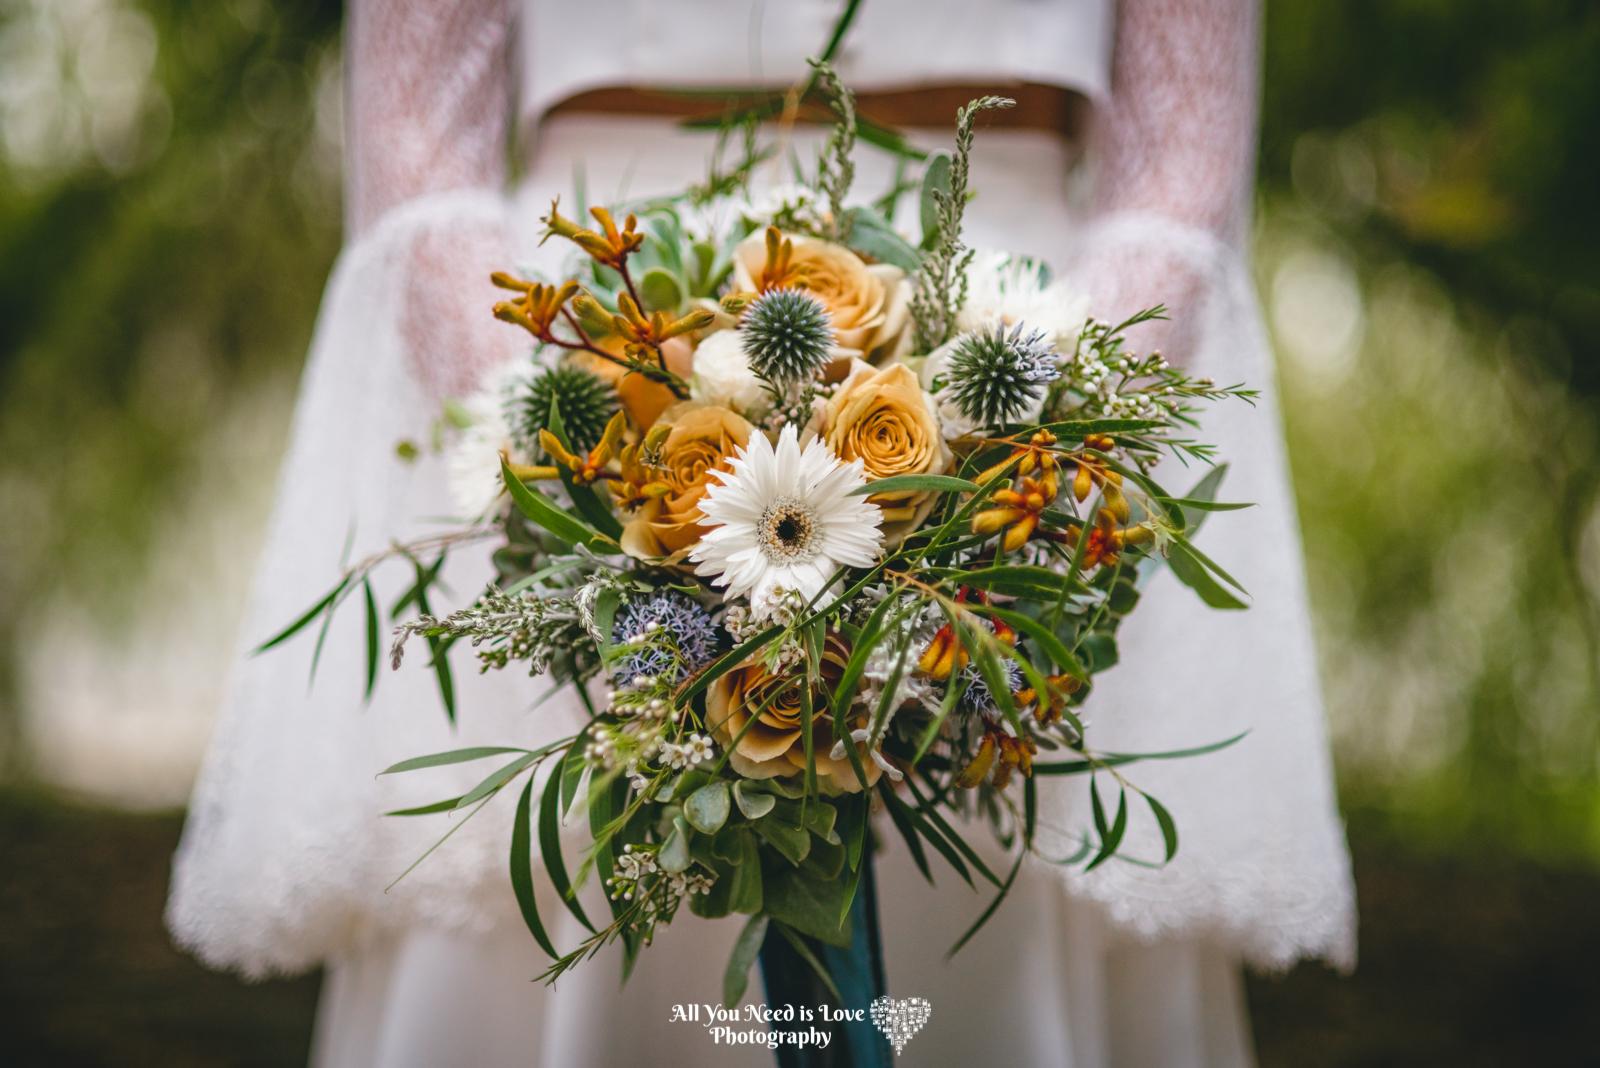 Old Deanery Ripon Wedding photographer, Yorkshire Yurts Wedding Photos, Ripon Wedding Photographer, Ripon Cathedral wedding.